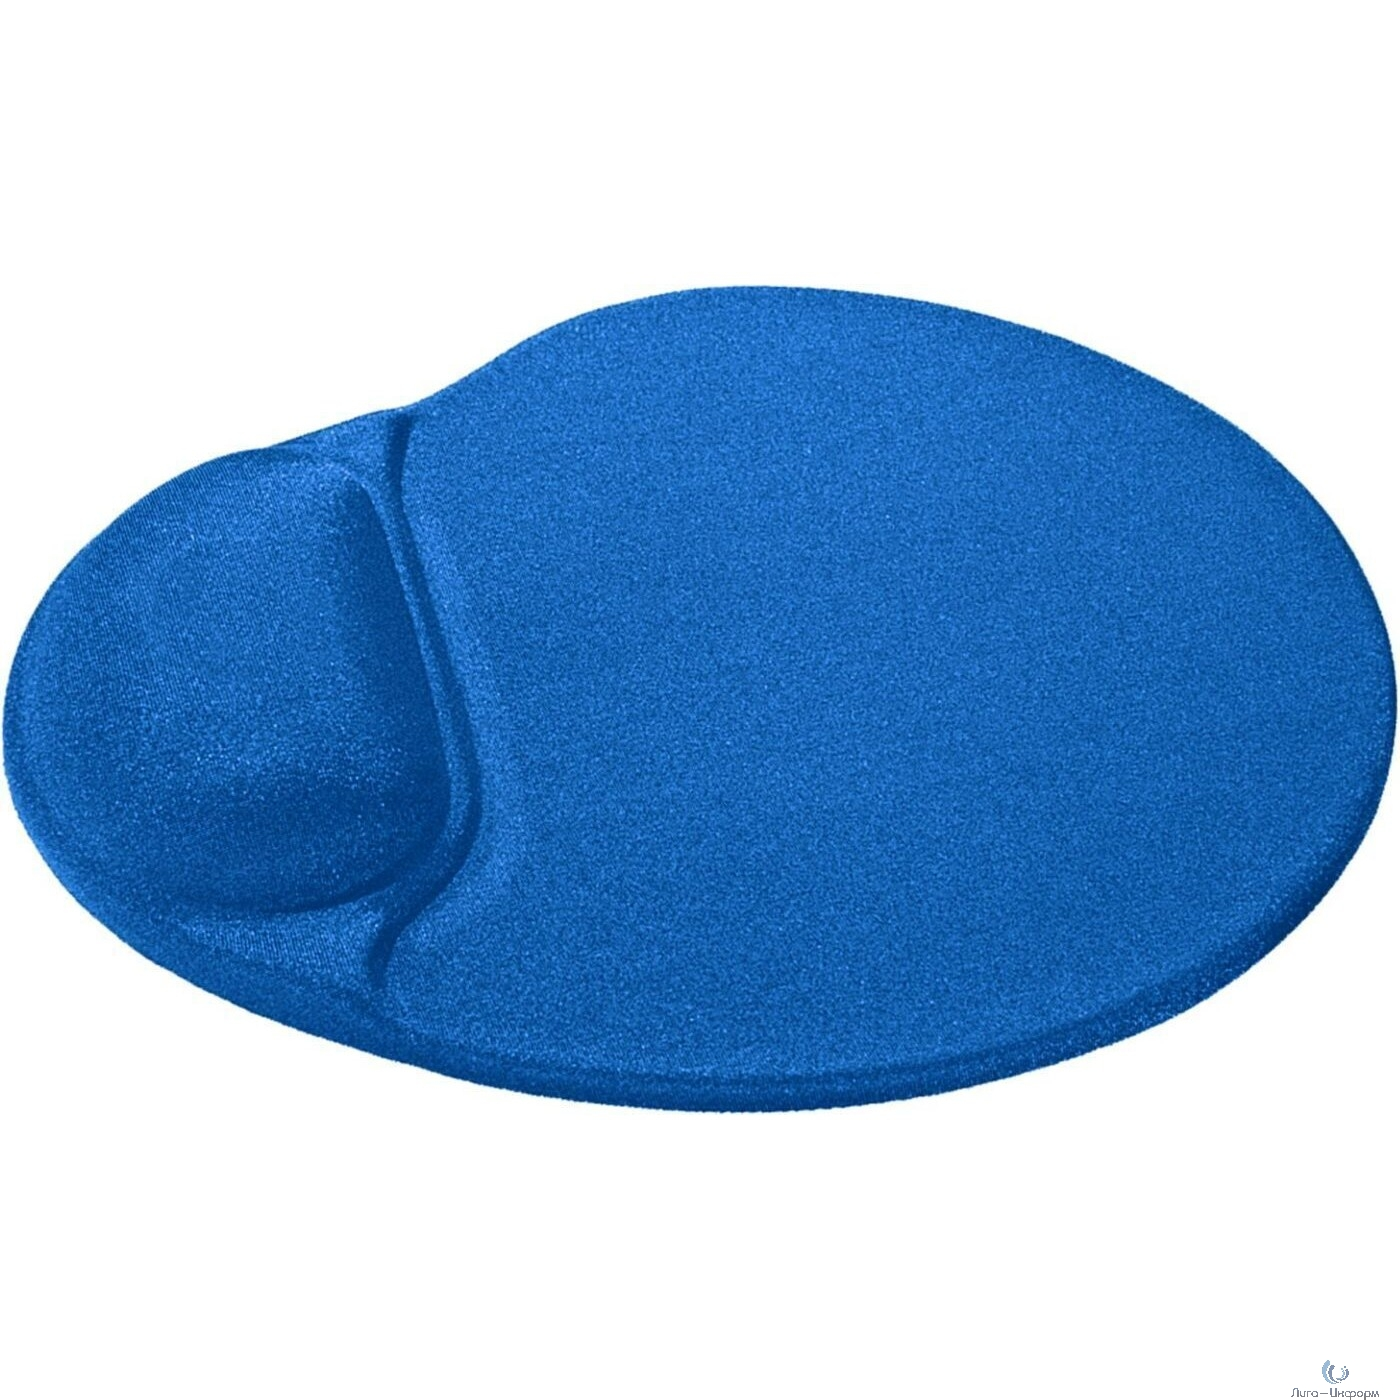 Defender Коврик для мыши Easy Work синий, 260х225х5 мм, лайкра [50916]